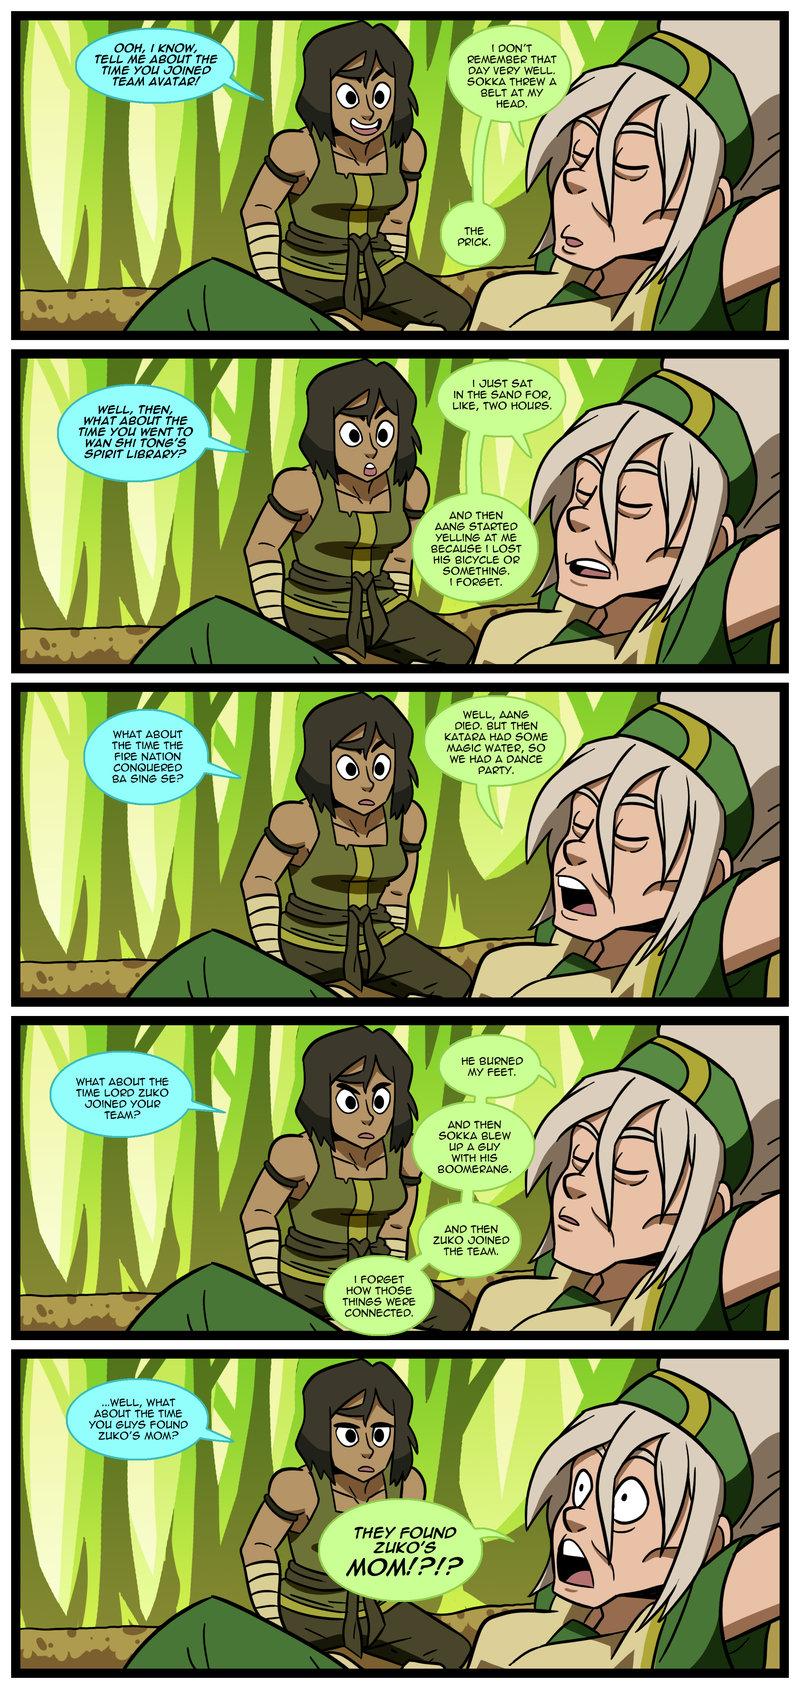 Avatar the Last Airbender - Avatar Aang x Katara - Keeping